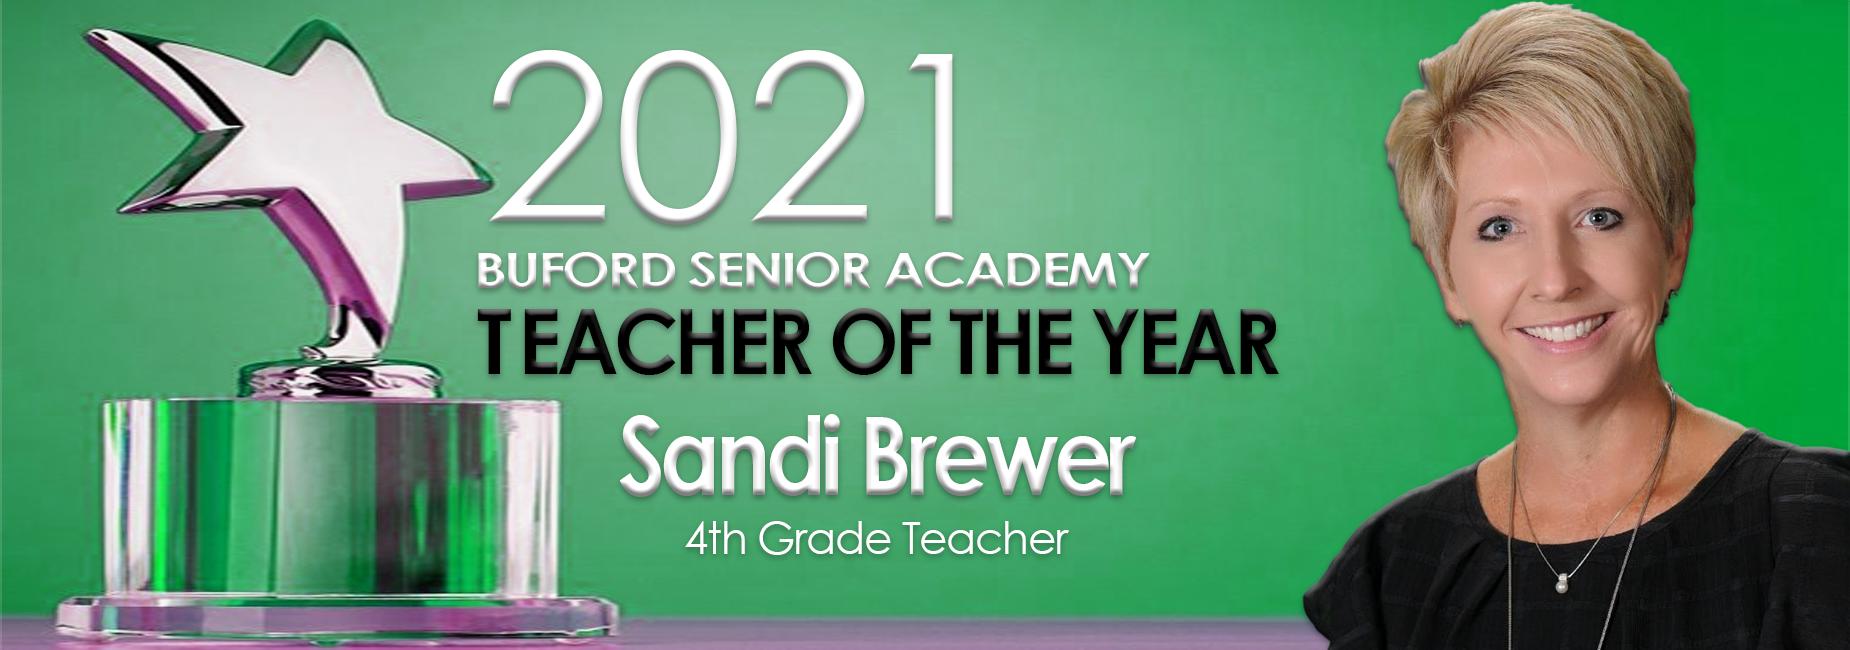 Teacher of the Year Sandi Brewer